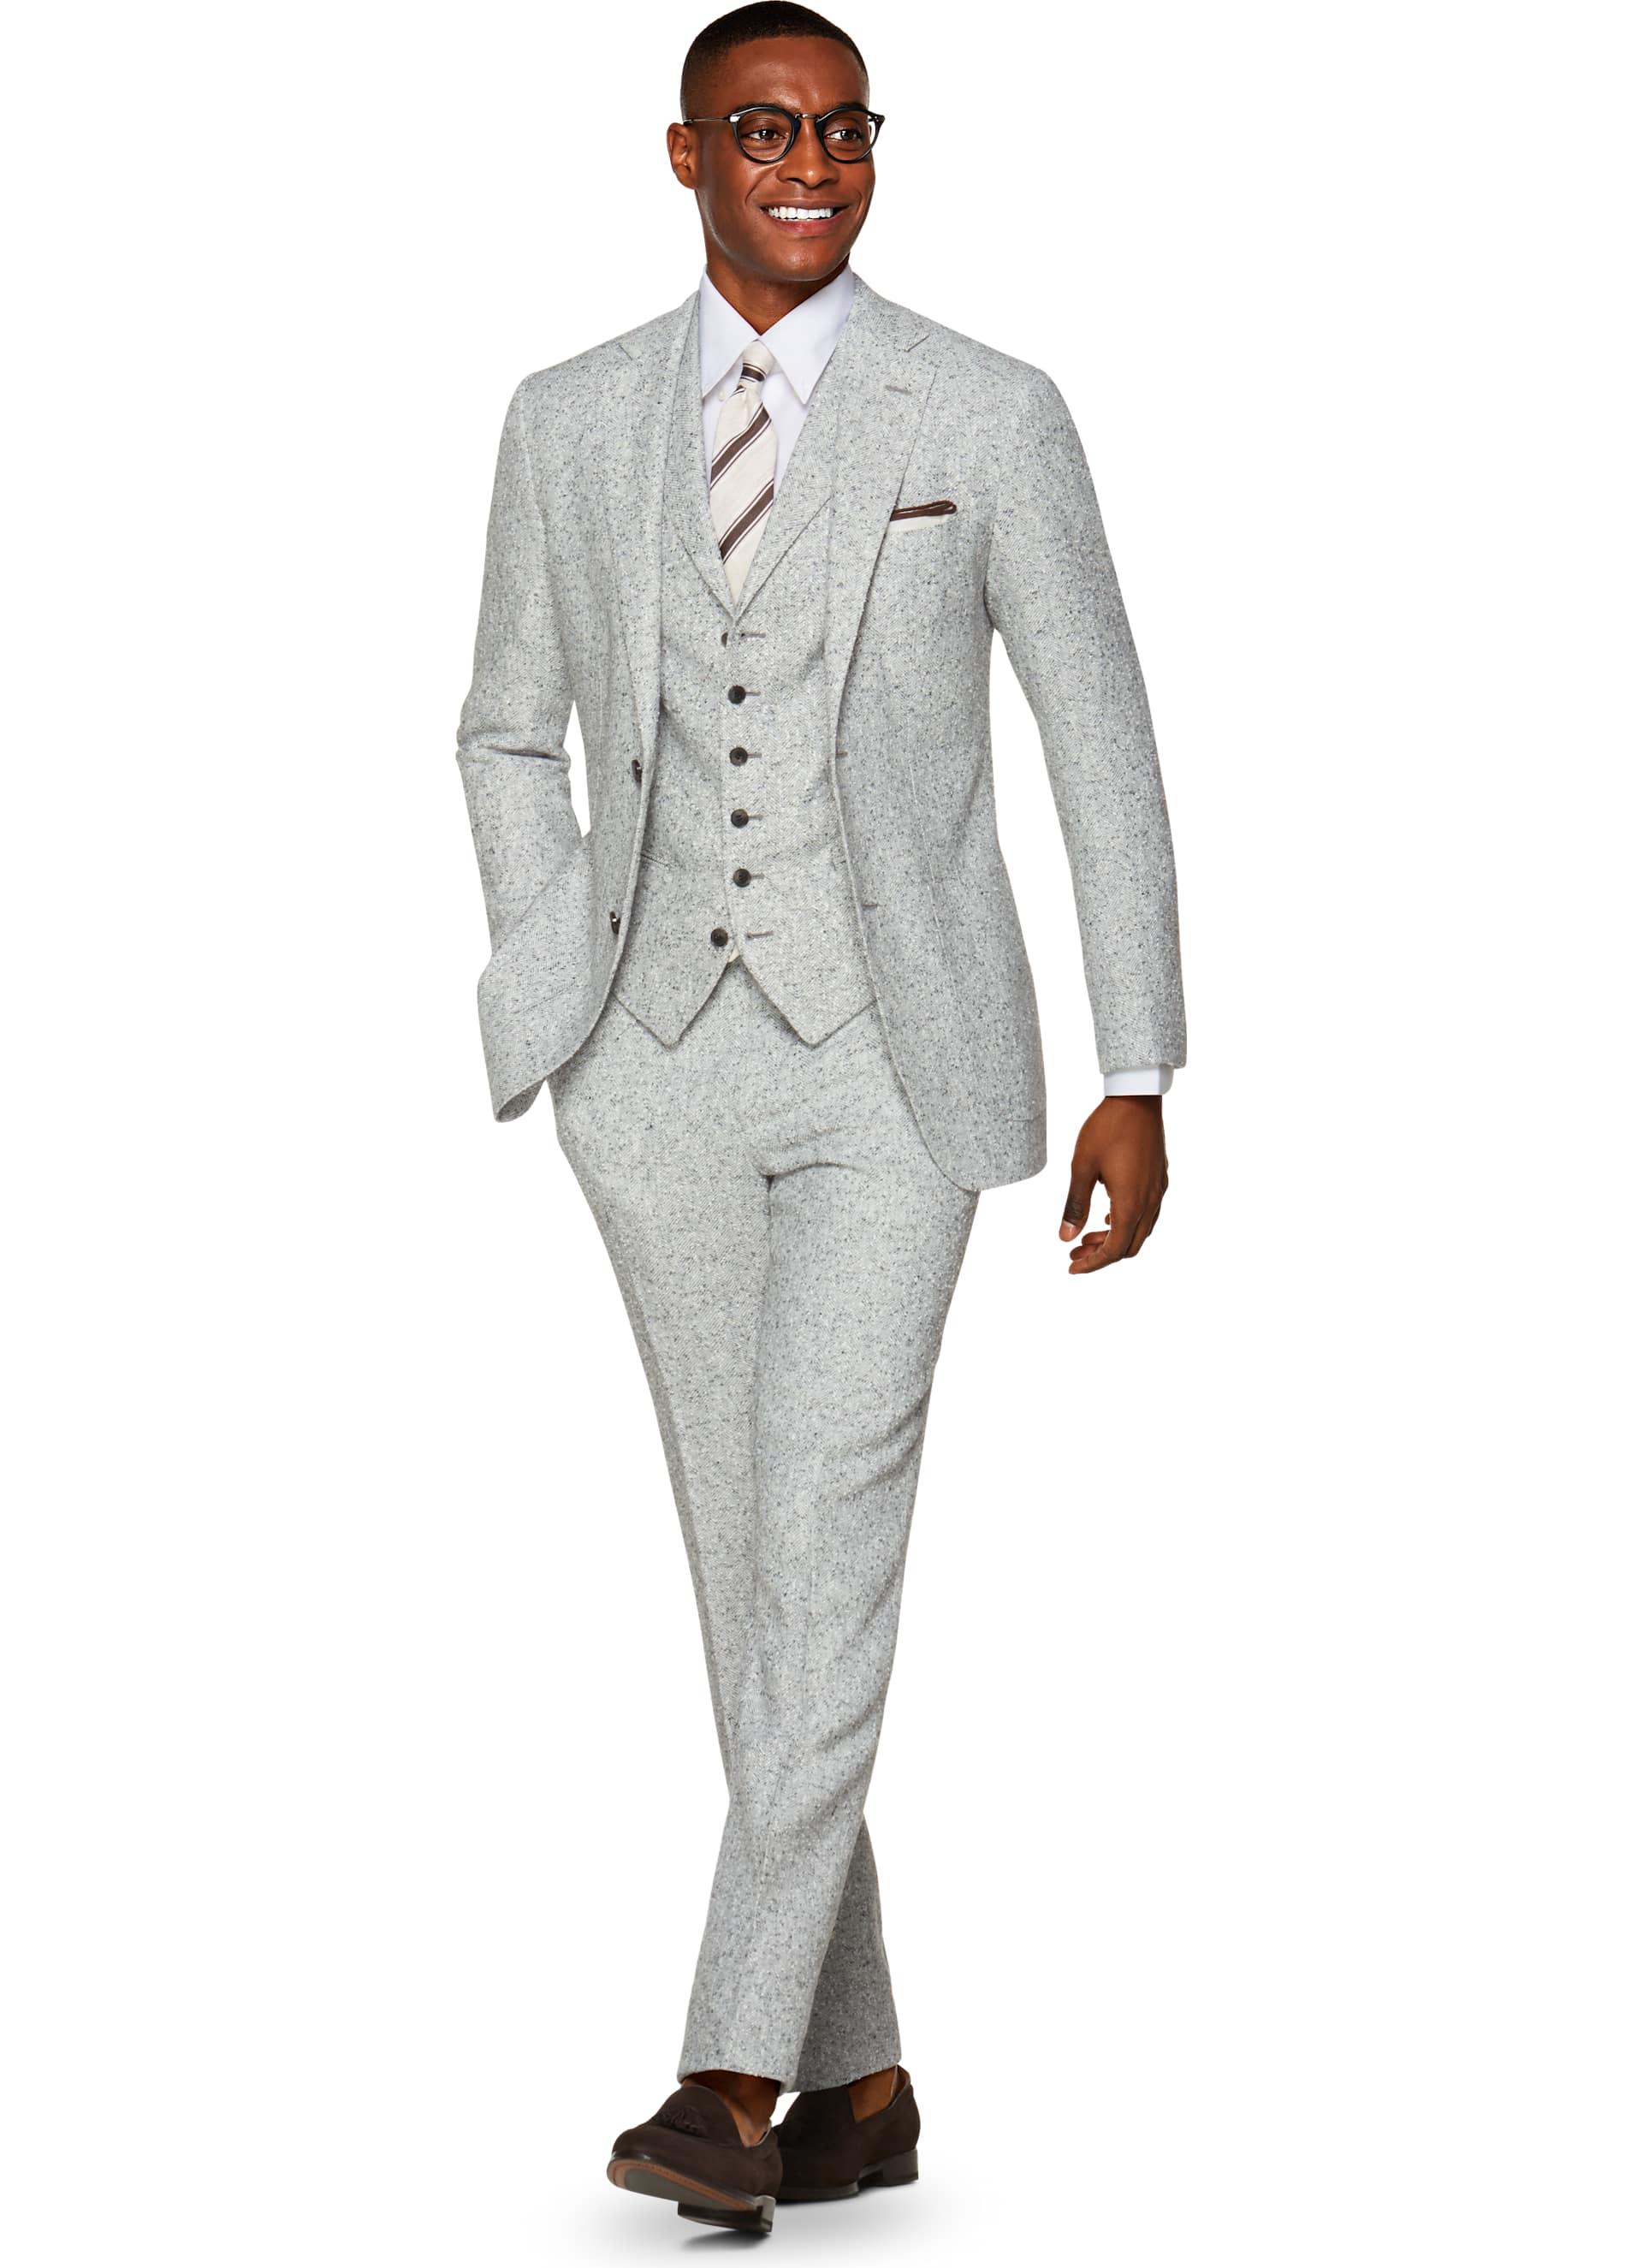 black men size system haggar pin slim jacket fit light s long up gray suit